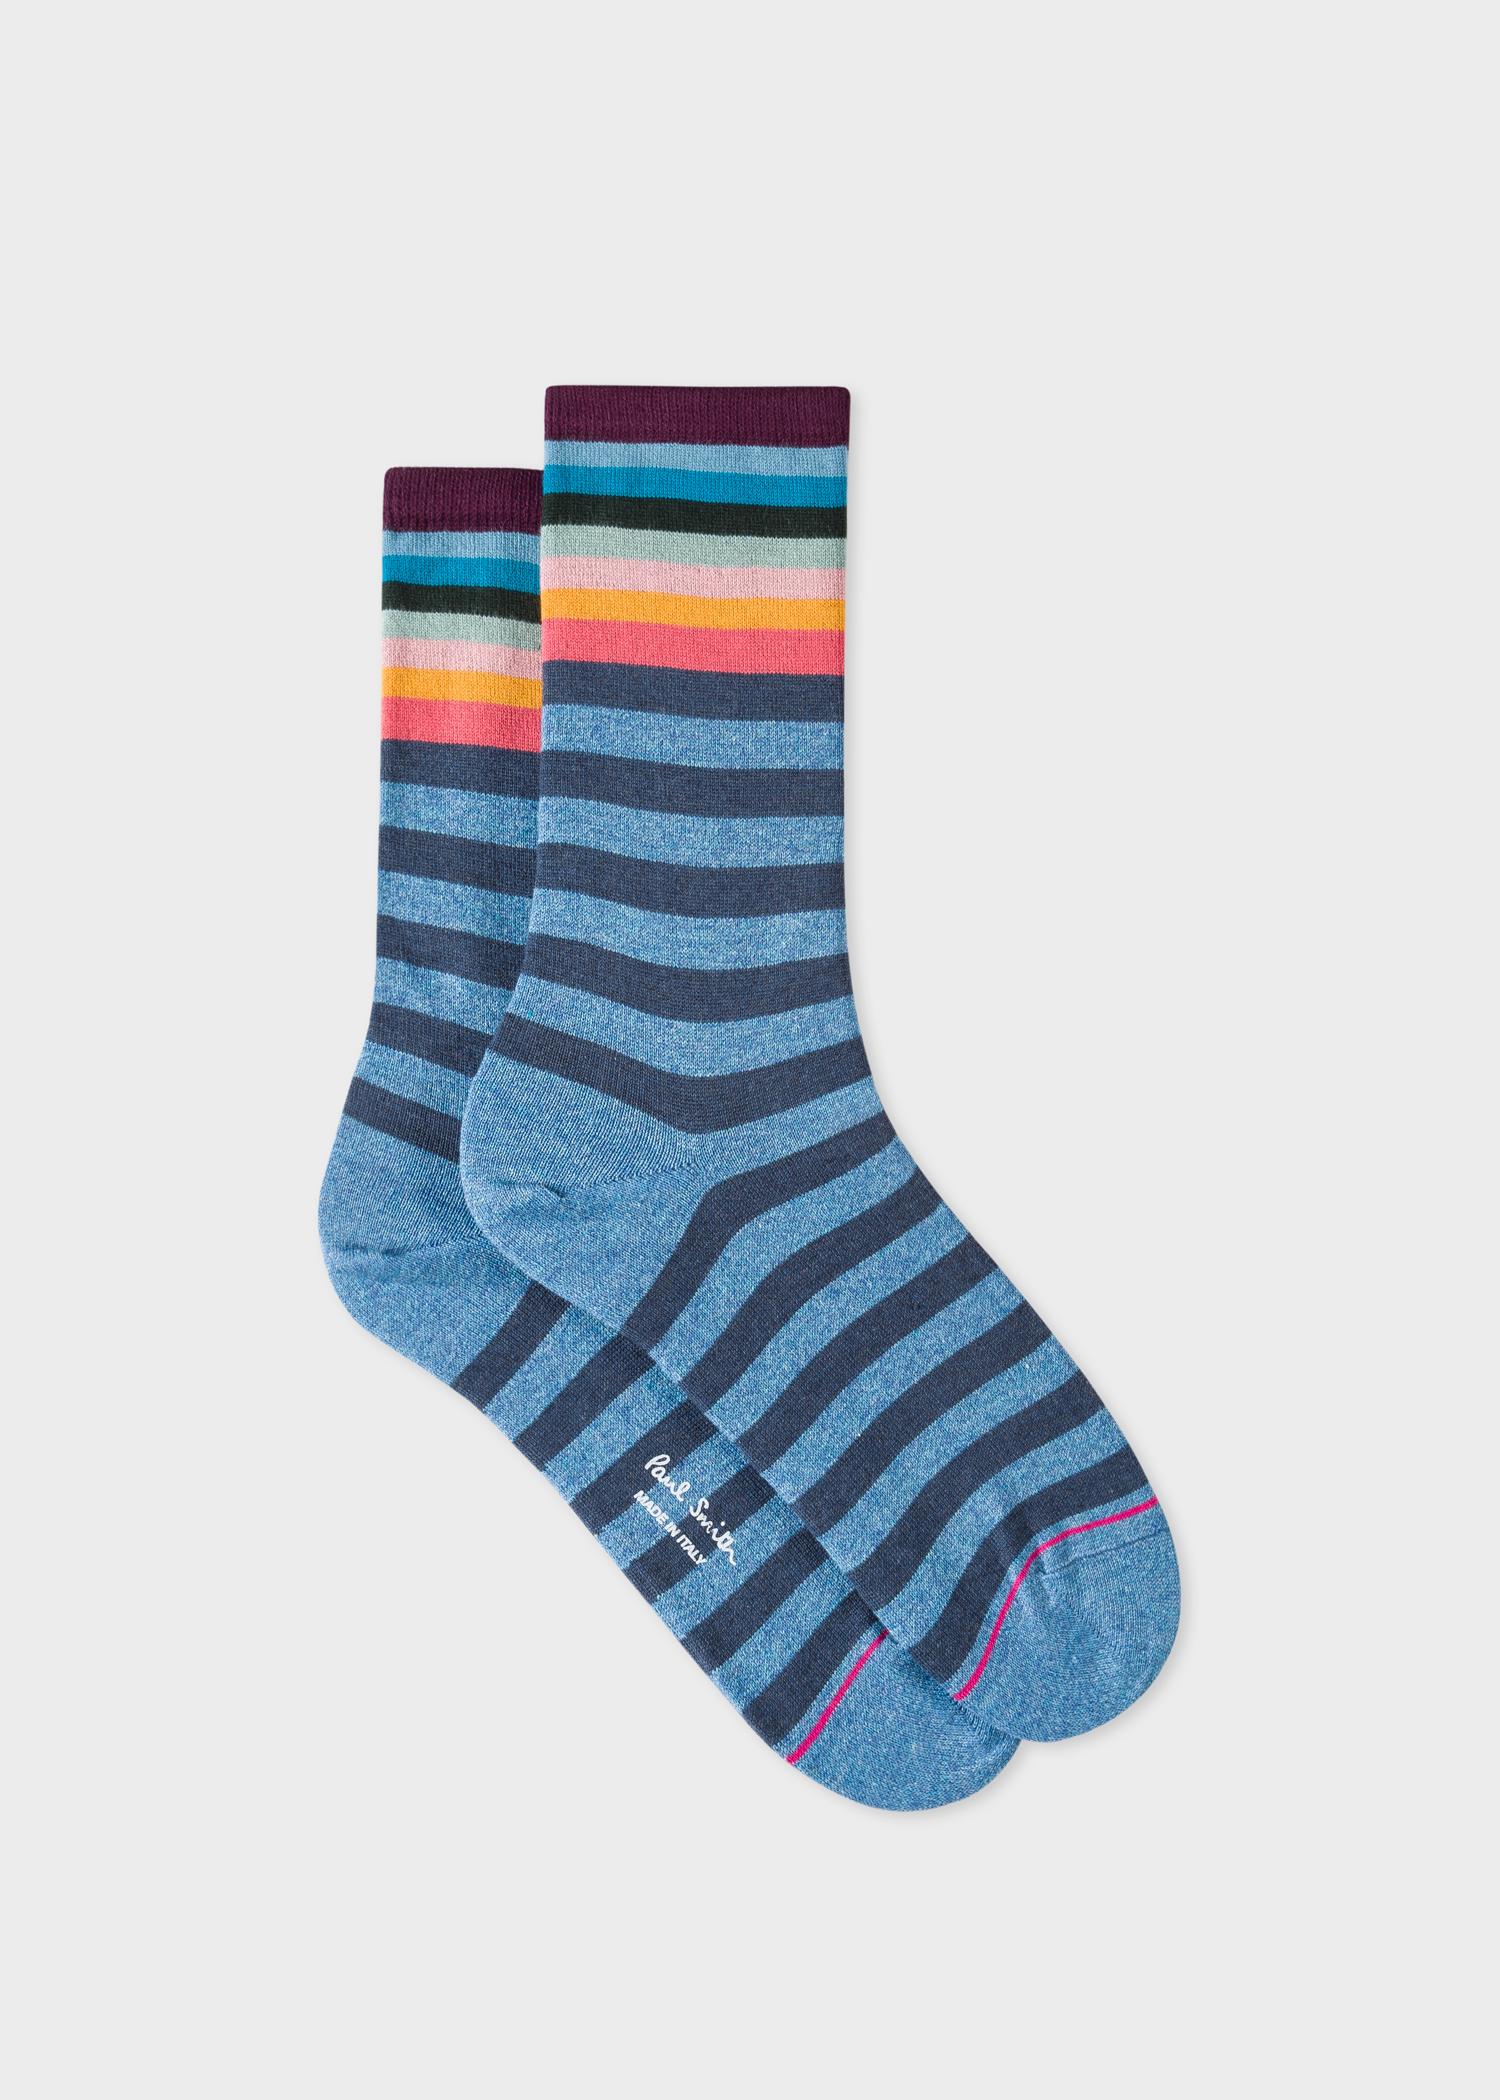 e37a2d7e8 Women's Blue And Navy Stripe Socks With 'Artist Stripe' Cuff